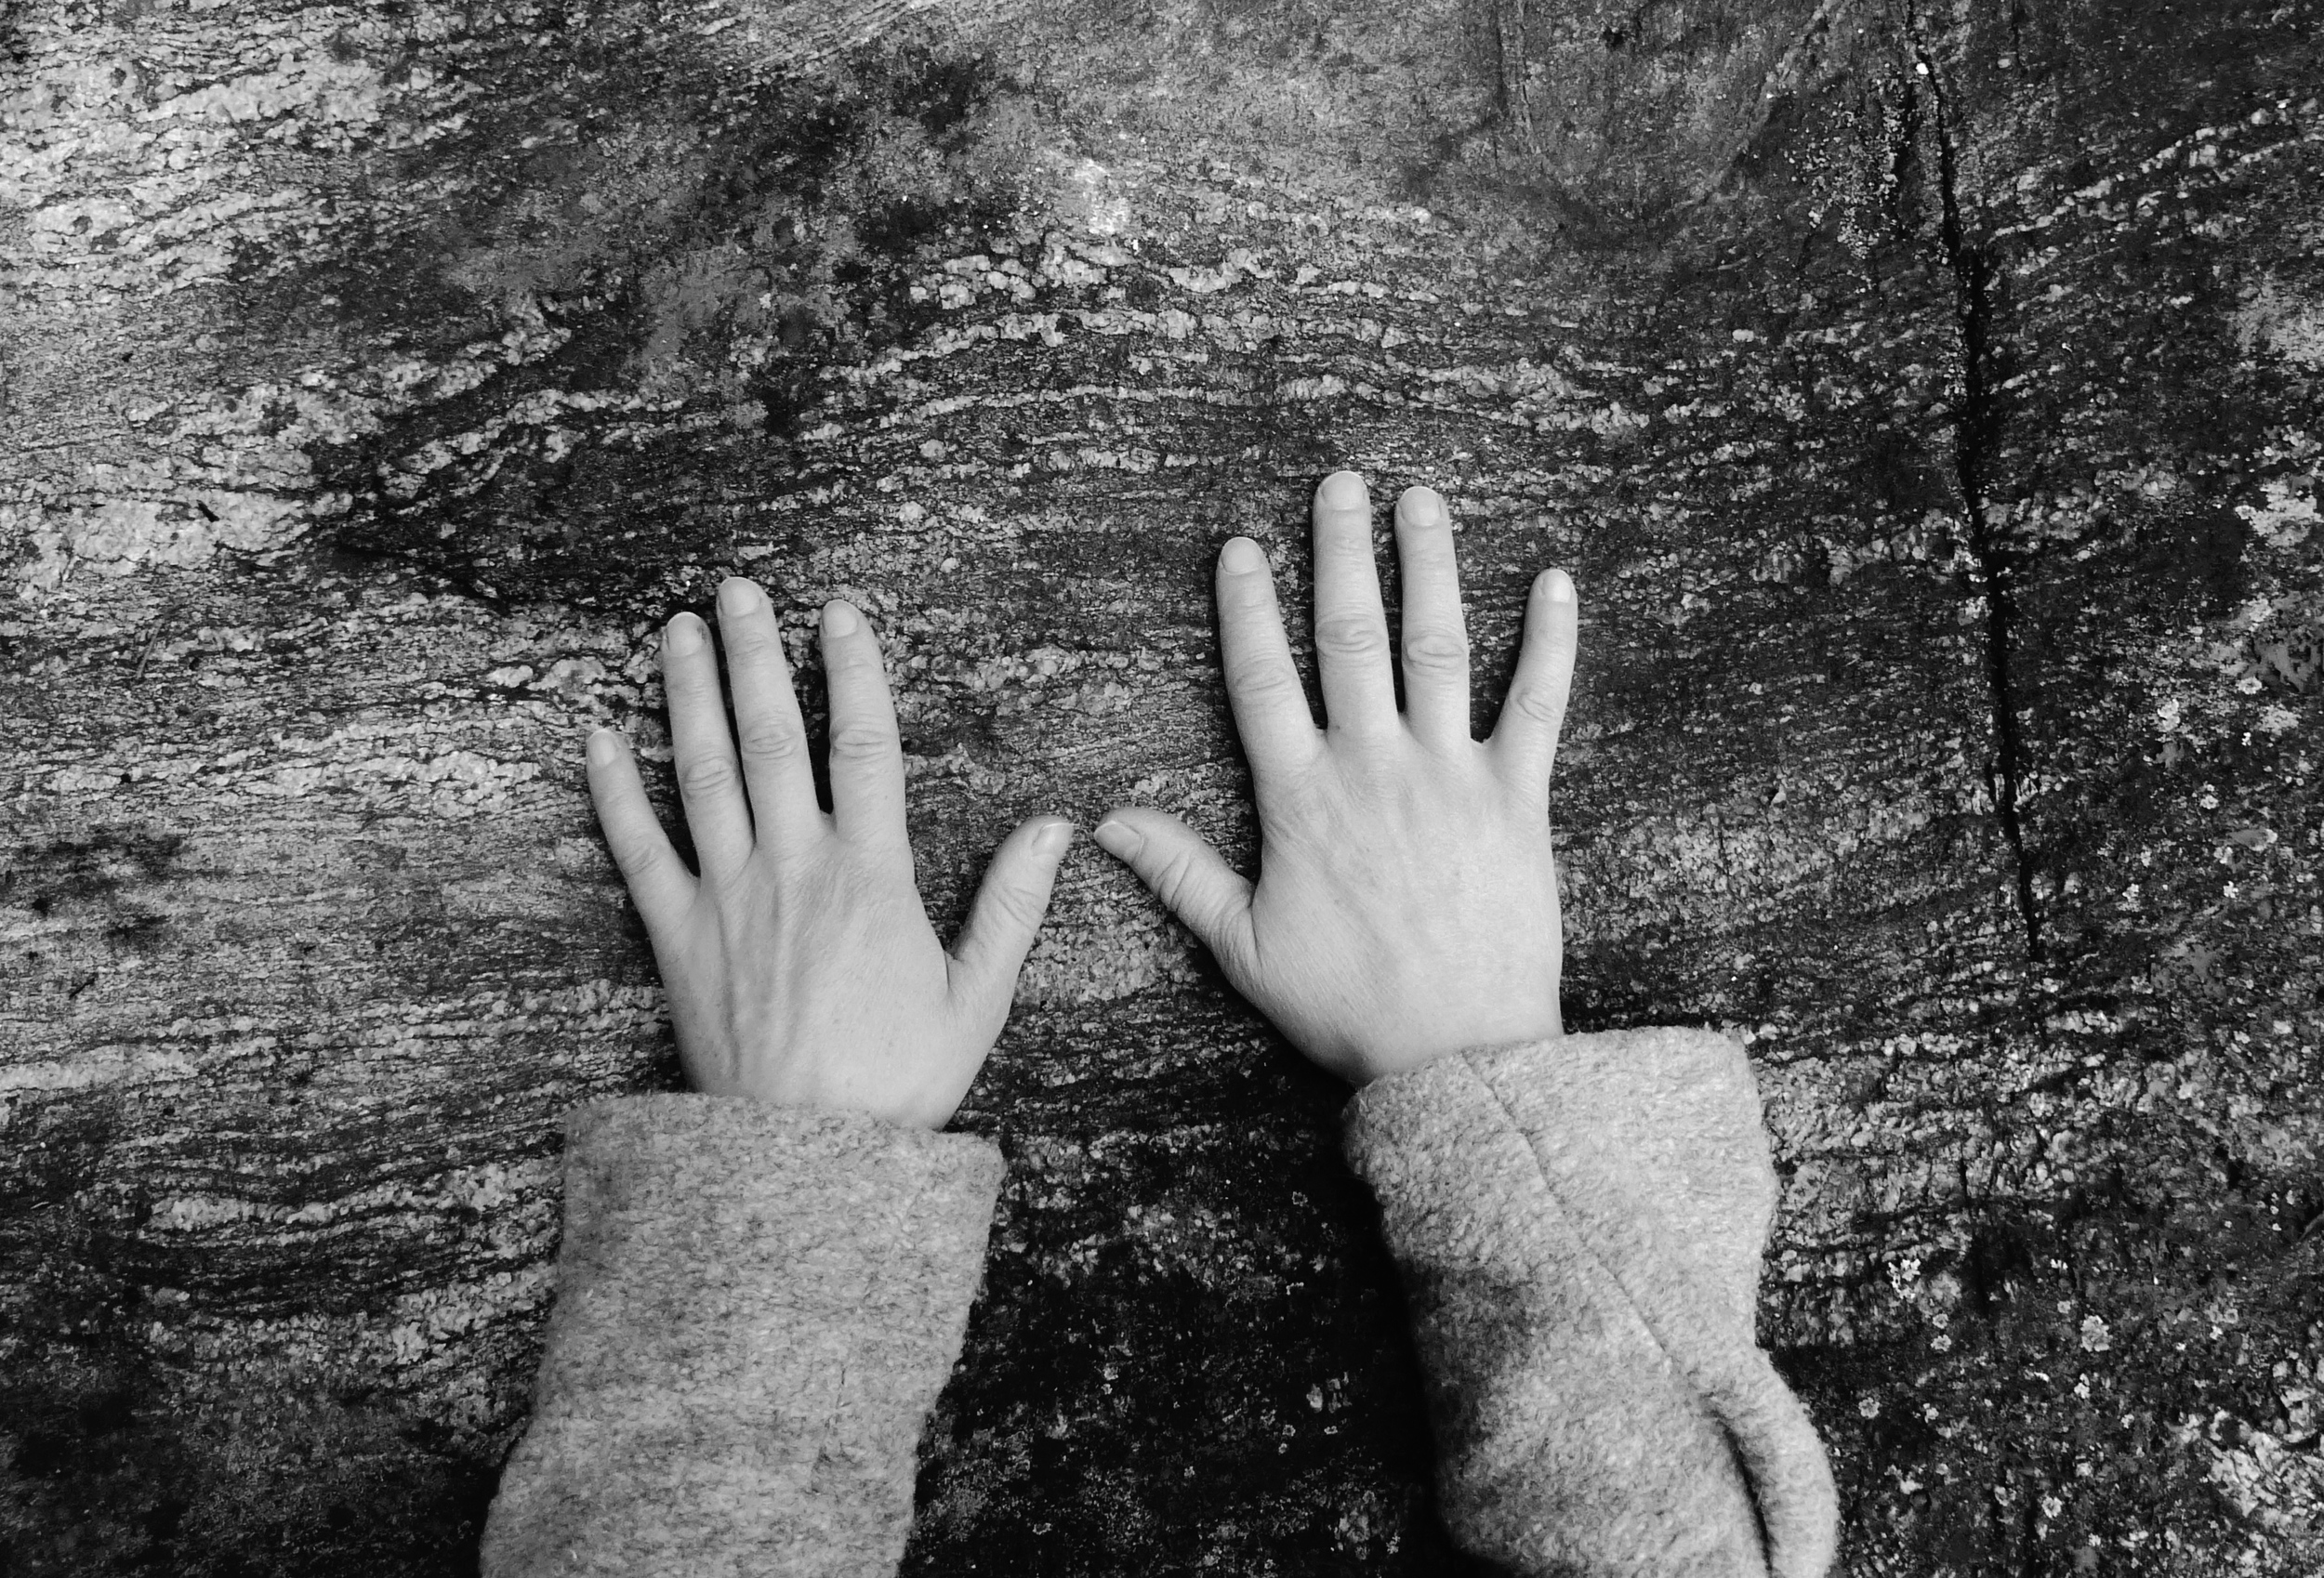 Artist's Hands, Satu Palokangas 2014